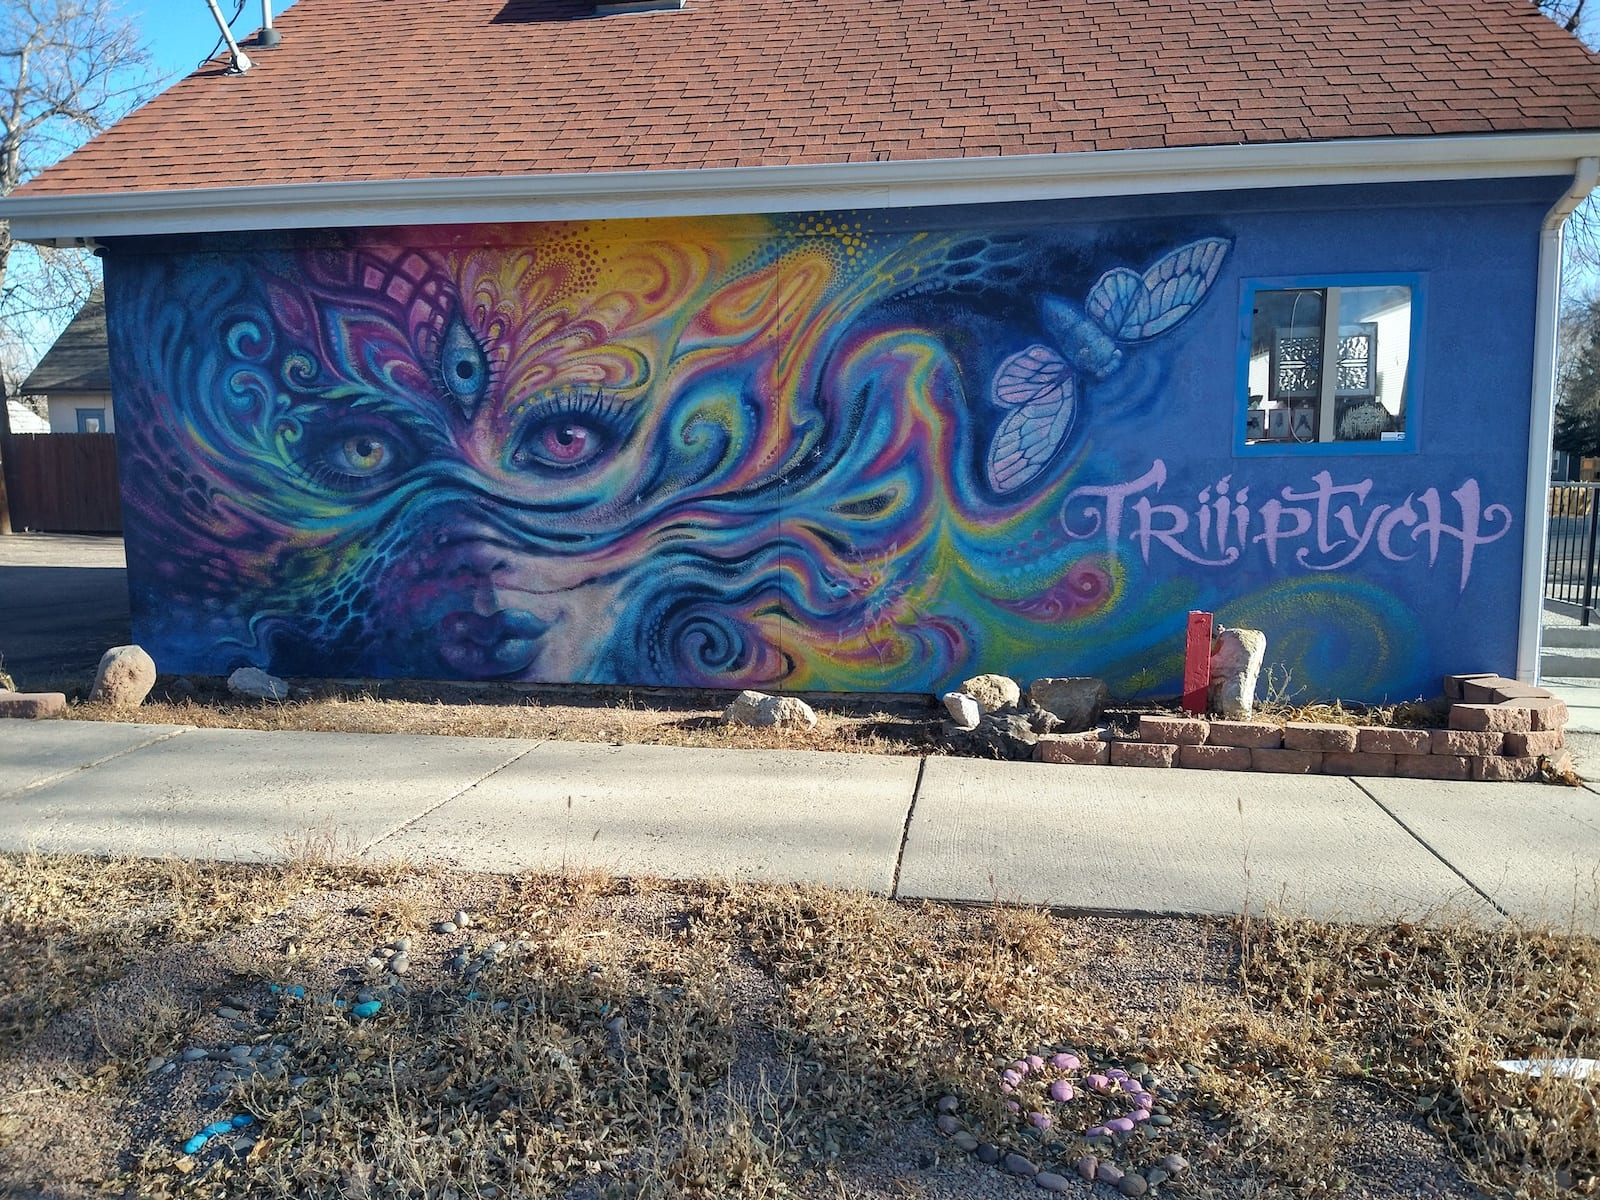 Colorado Springs Mural Triiptych